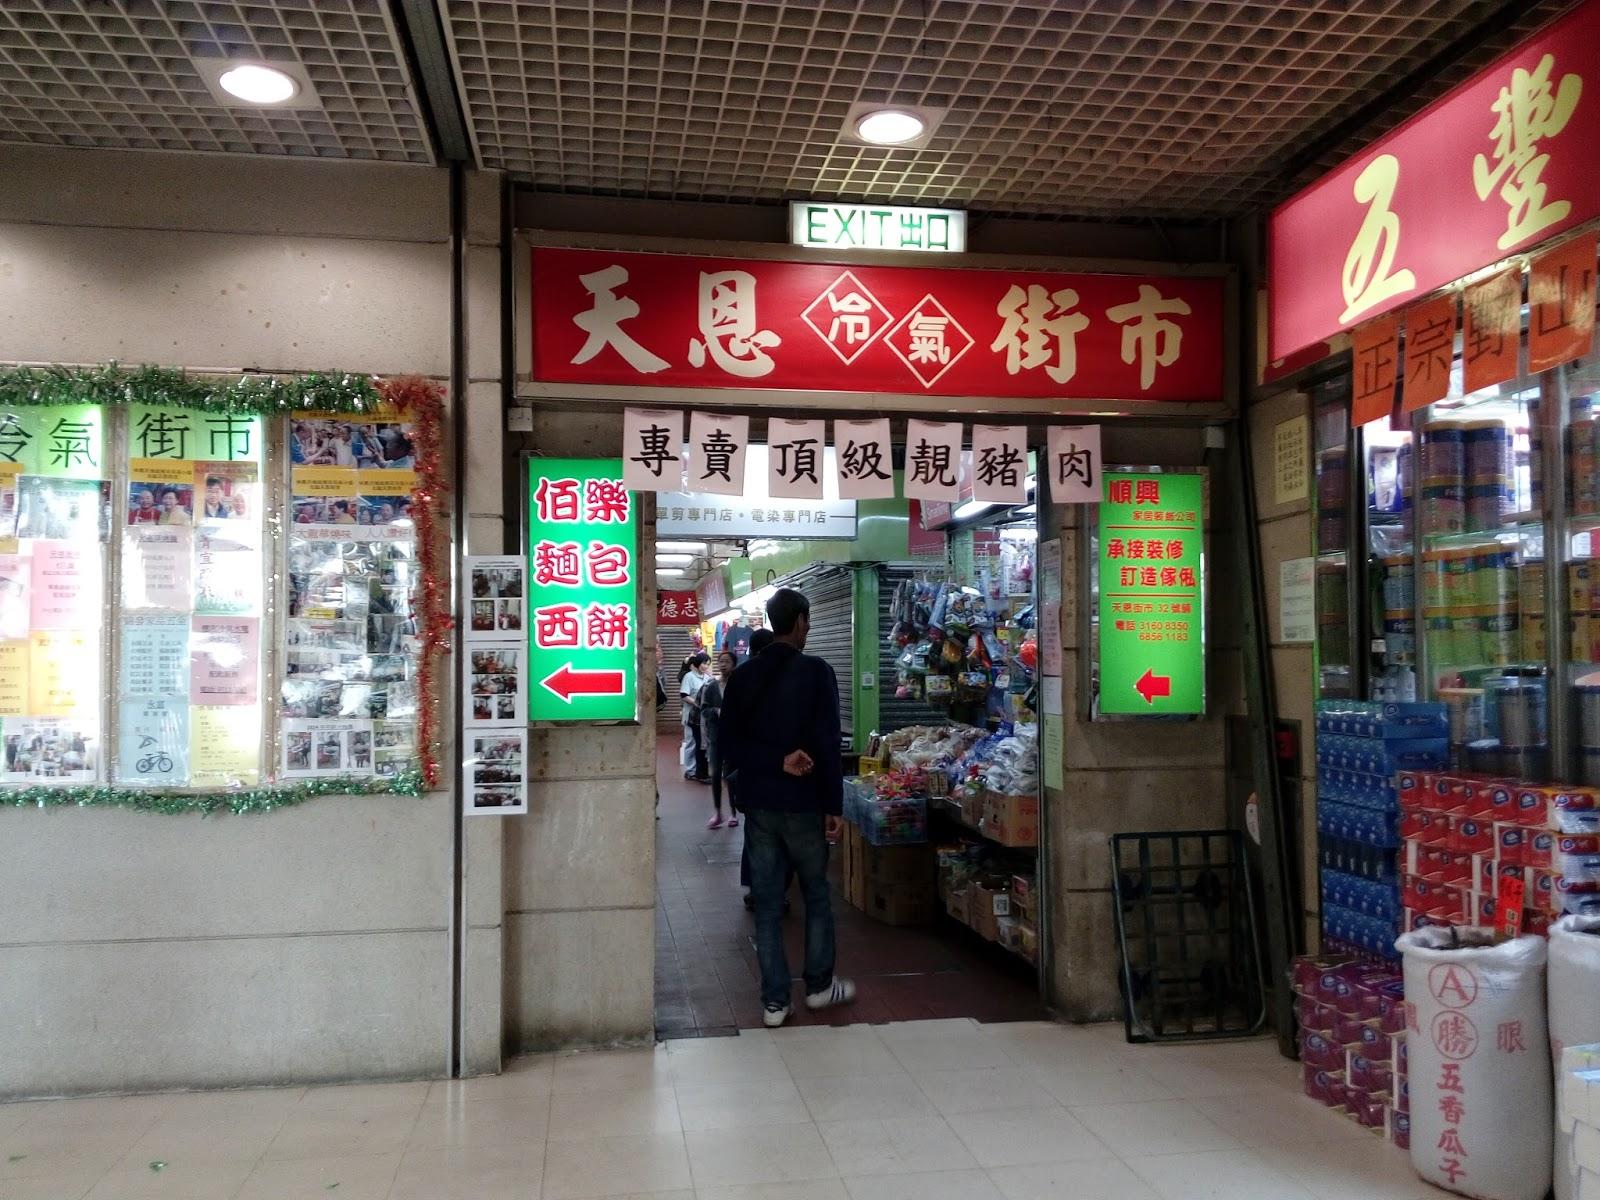 Grassroots O2: [房署商場] 天恩商場 @2017-04-01